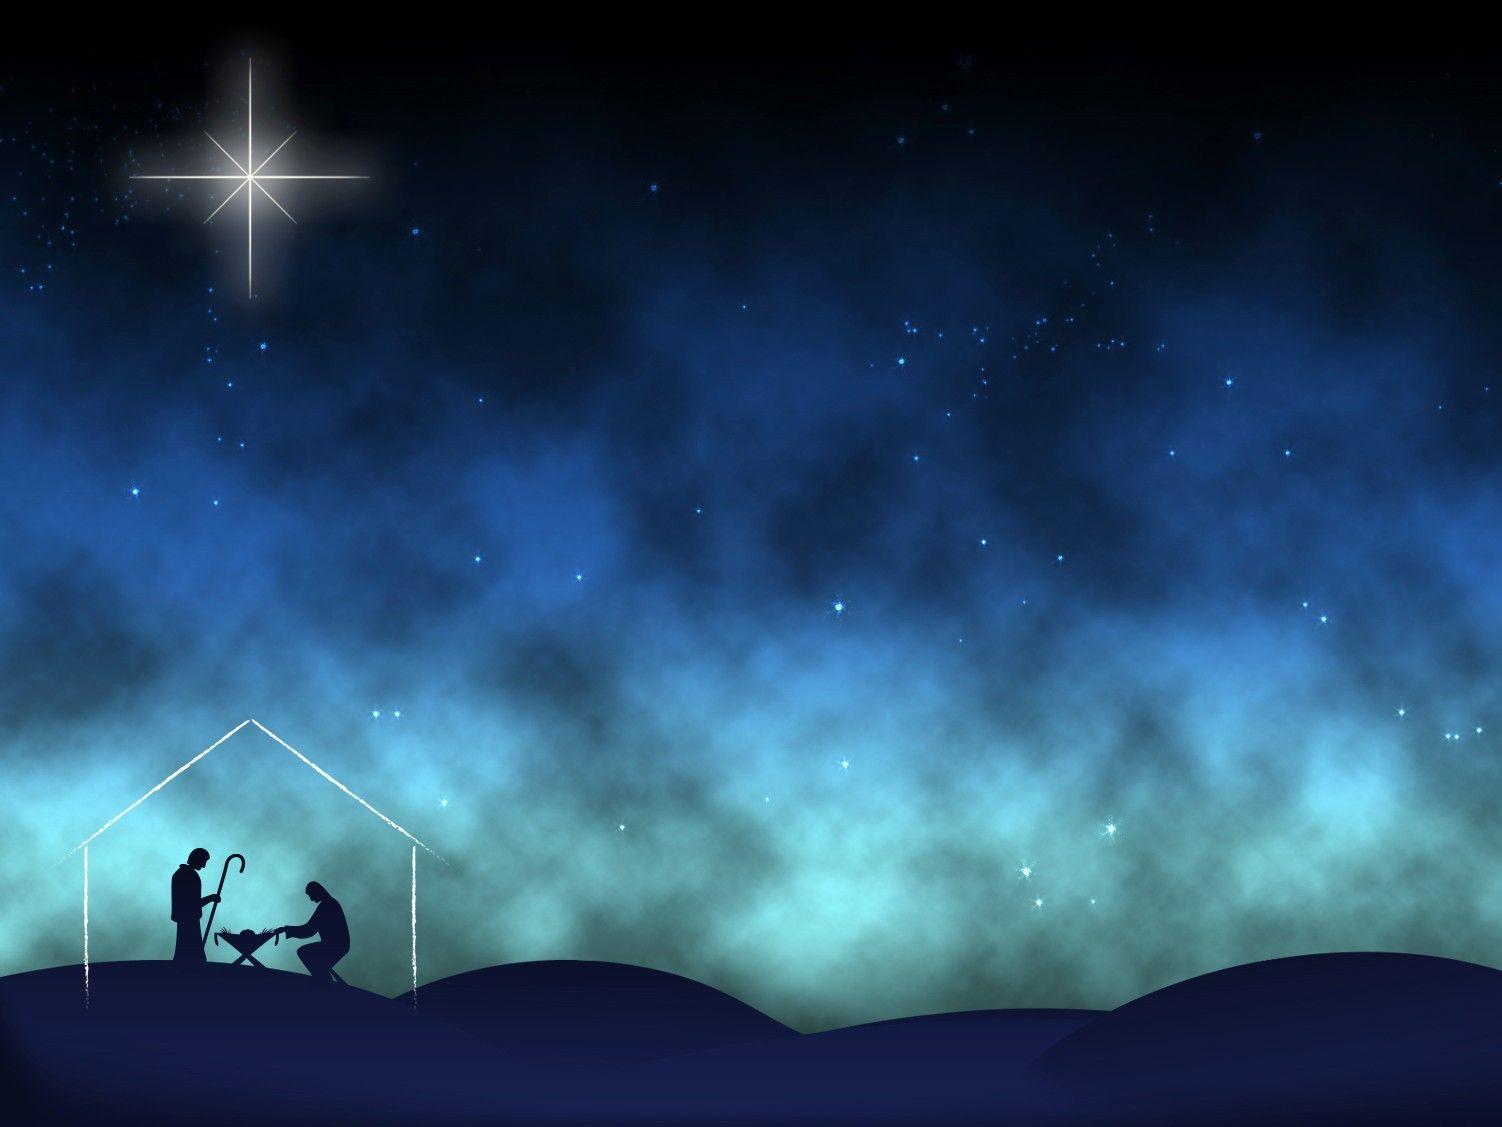 Hark The Herald Angels Sing Glory To The Newborn King